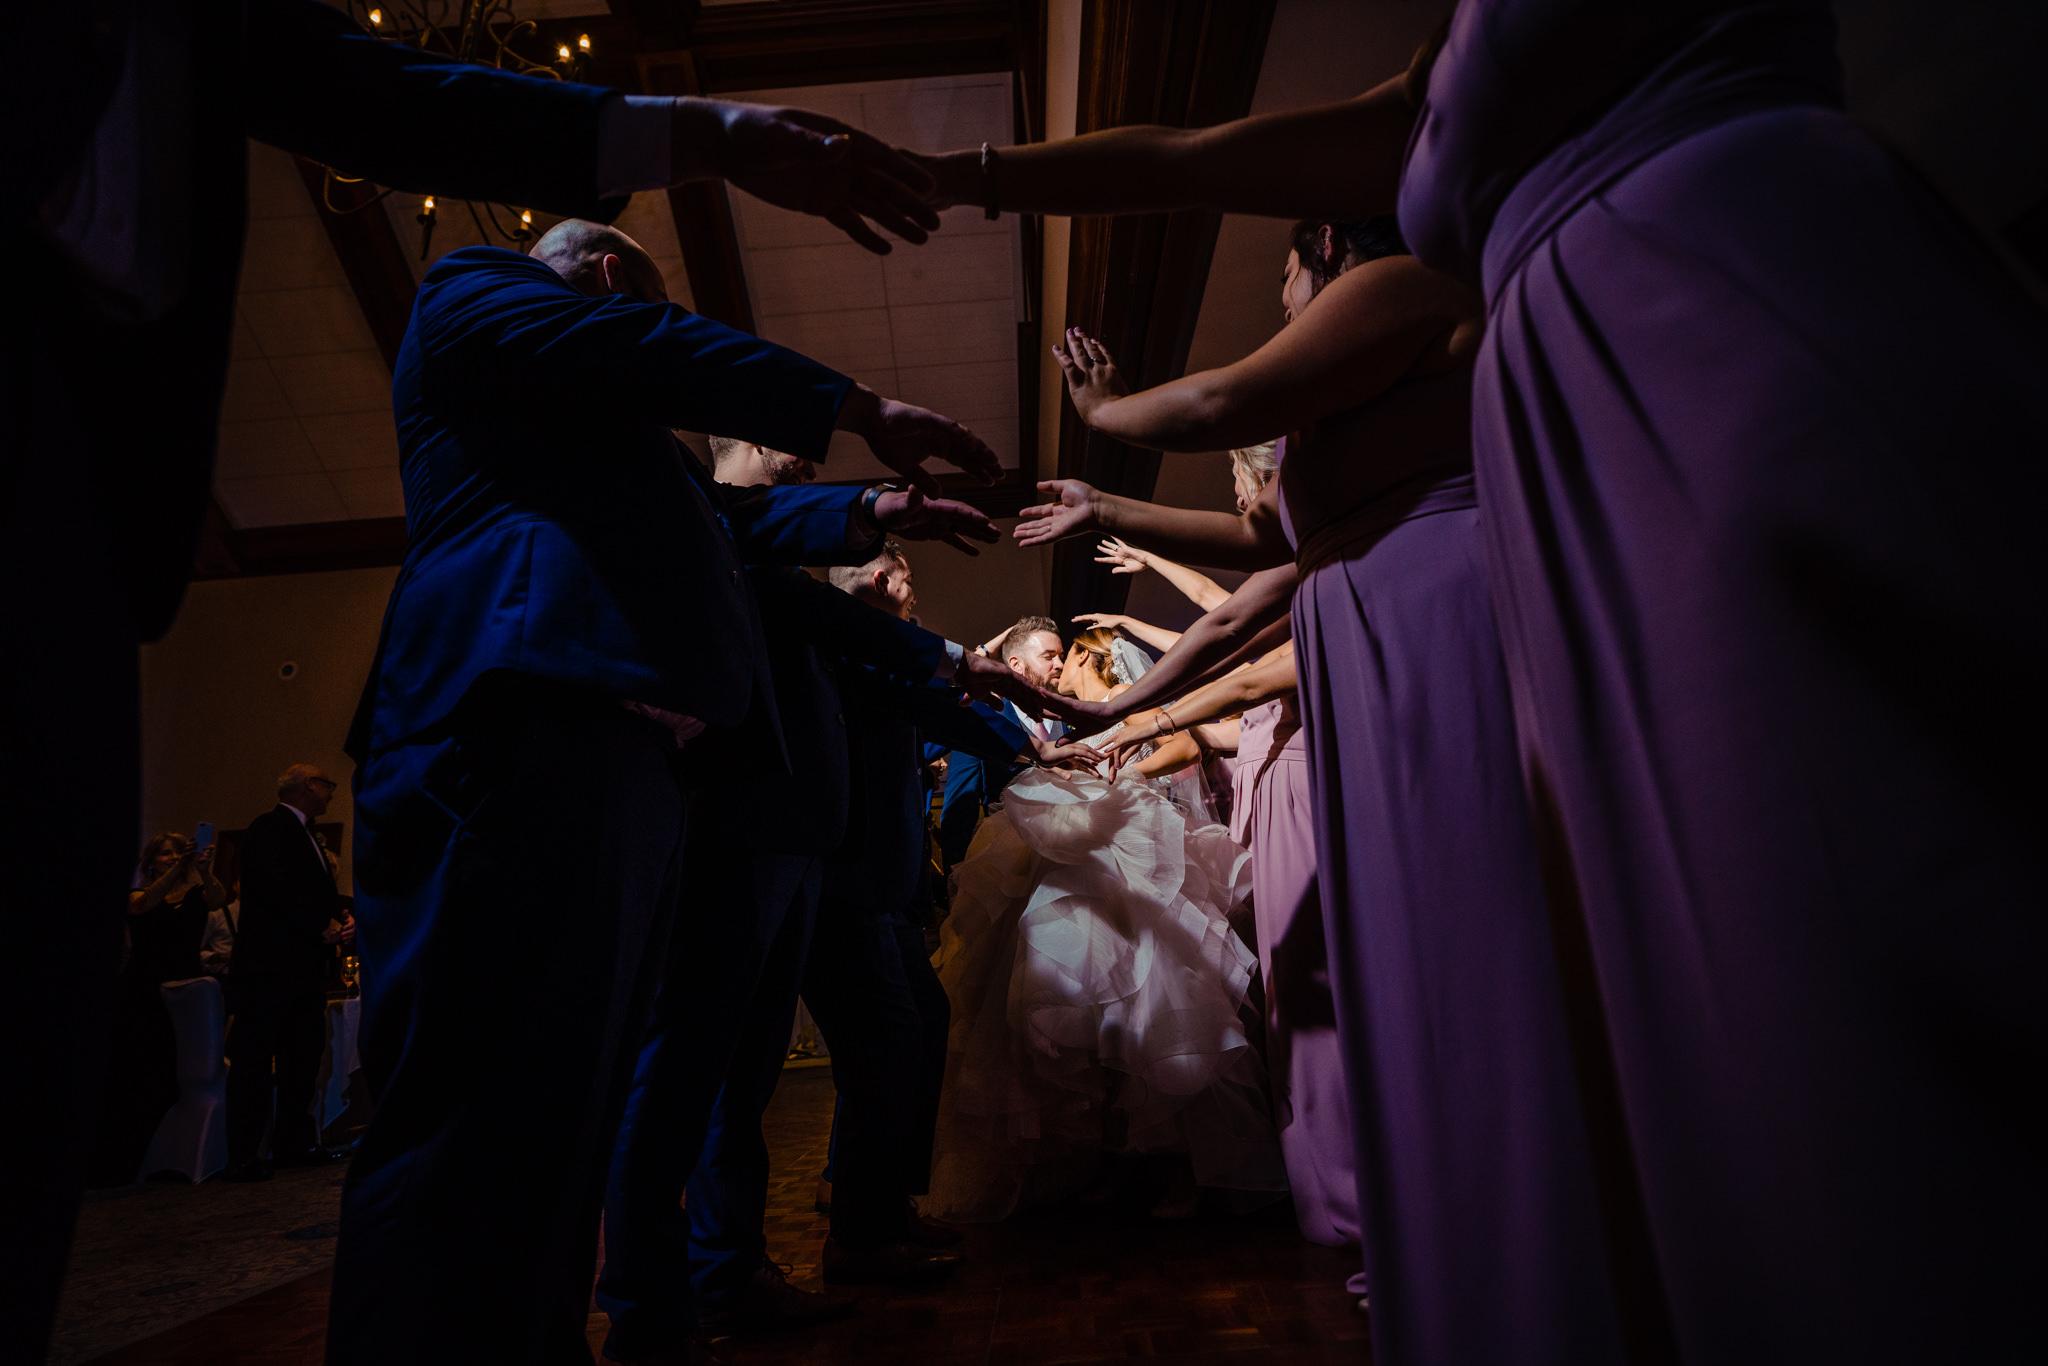 Emily&Ron-Chapel-hill-wedding-barn-81.jpg